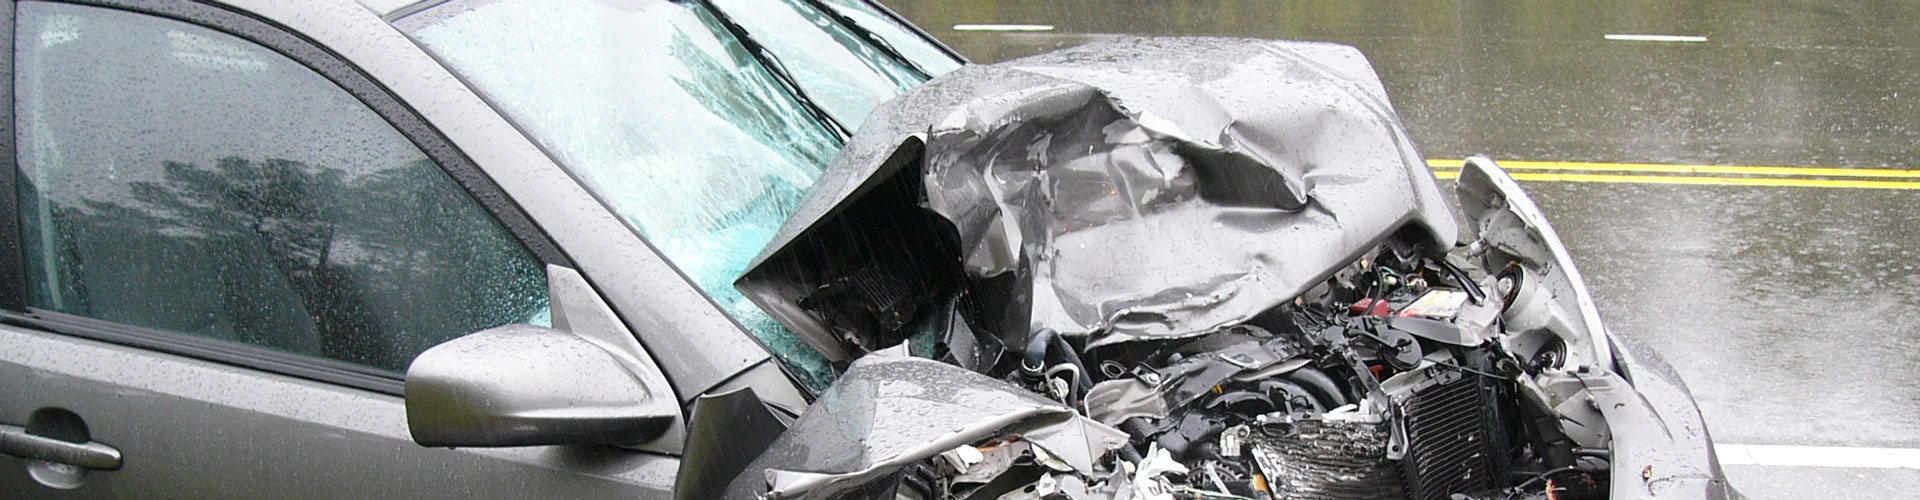 Materiele schade na een ongeval claimen